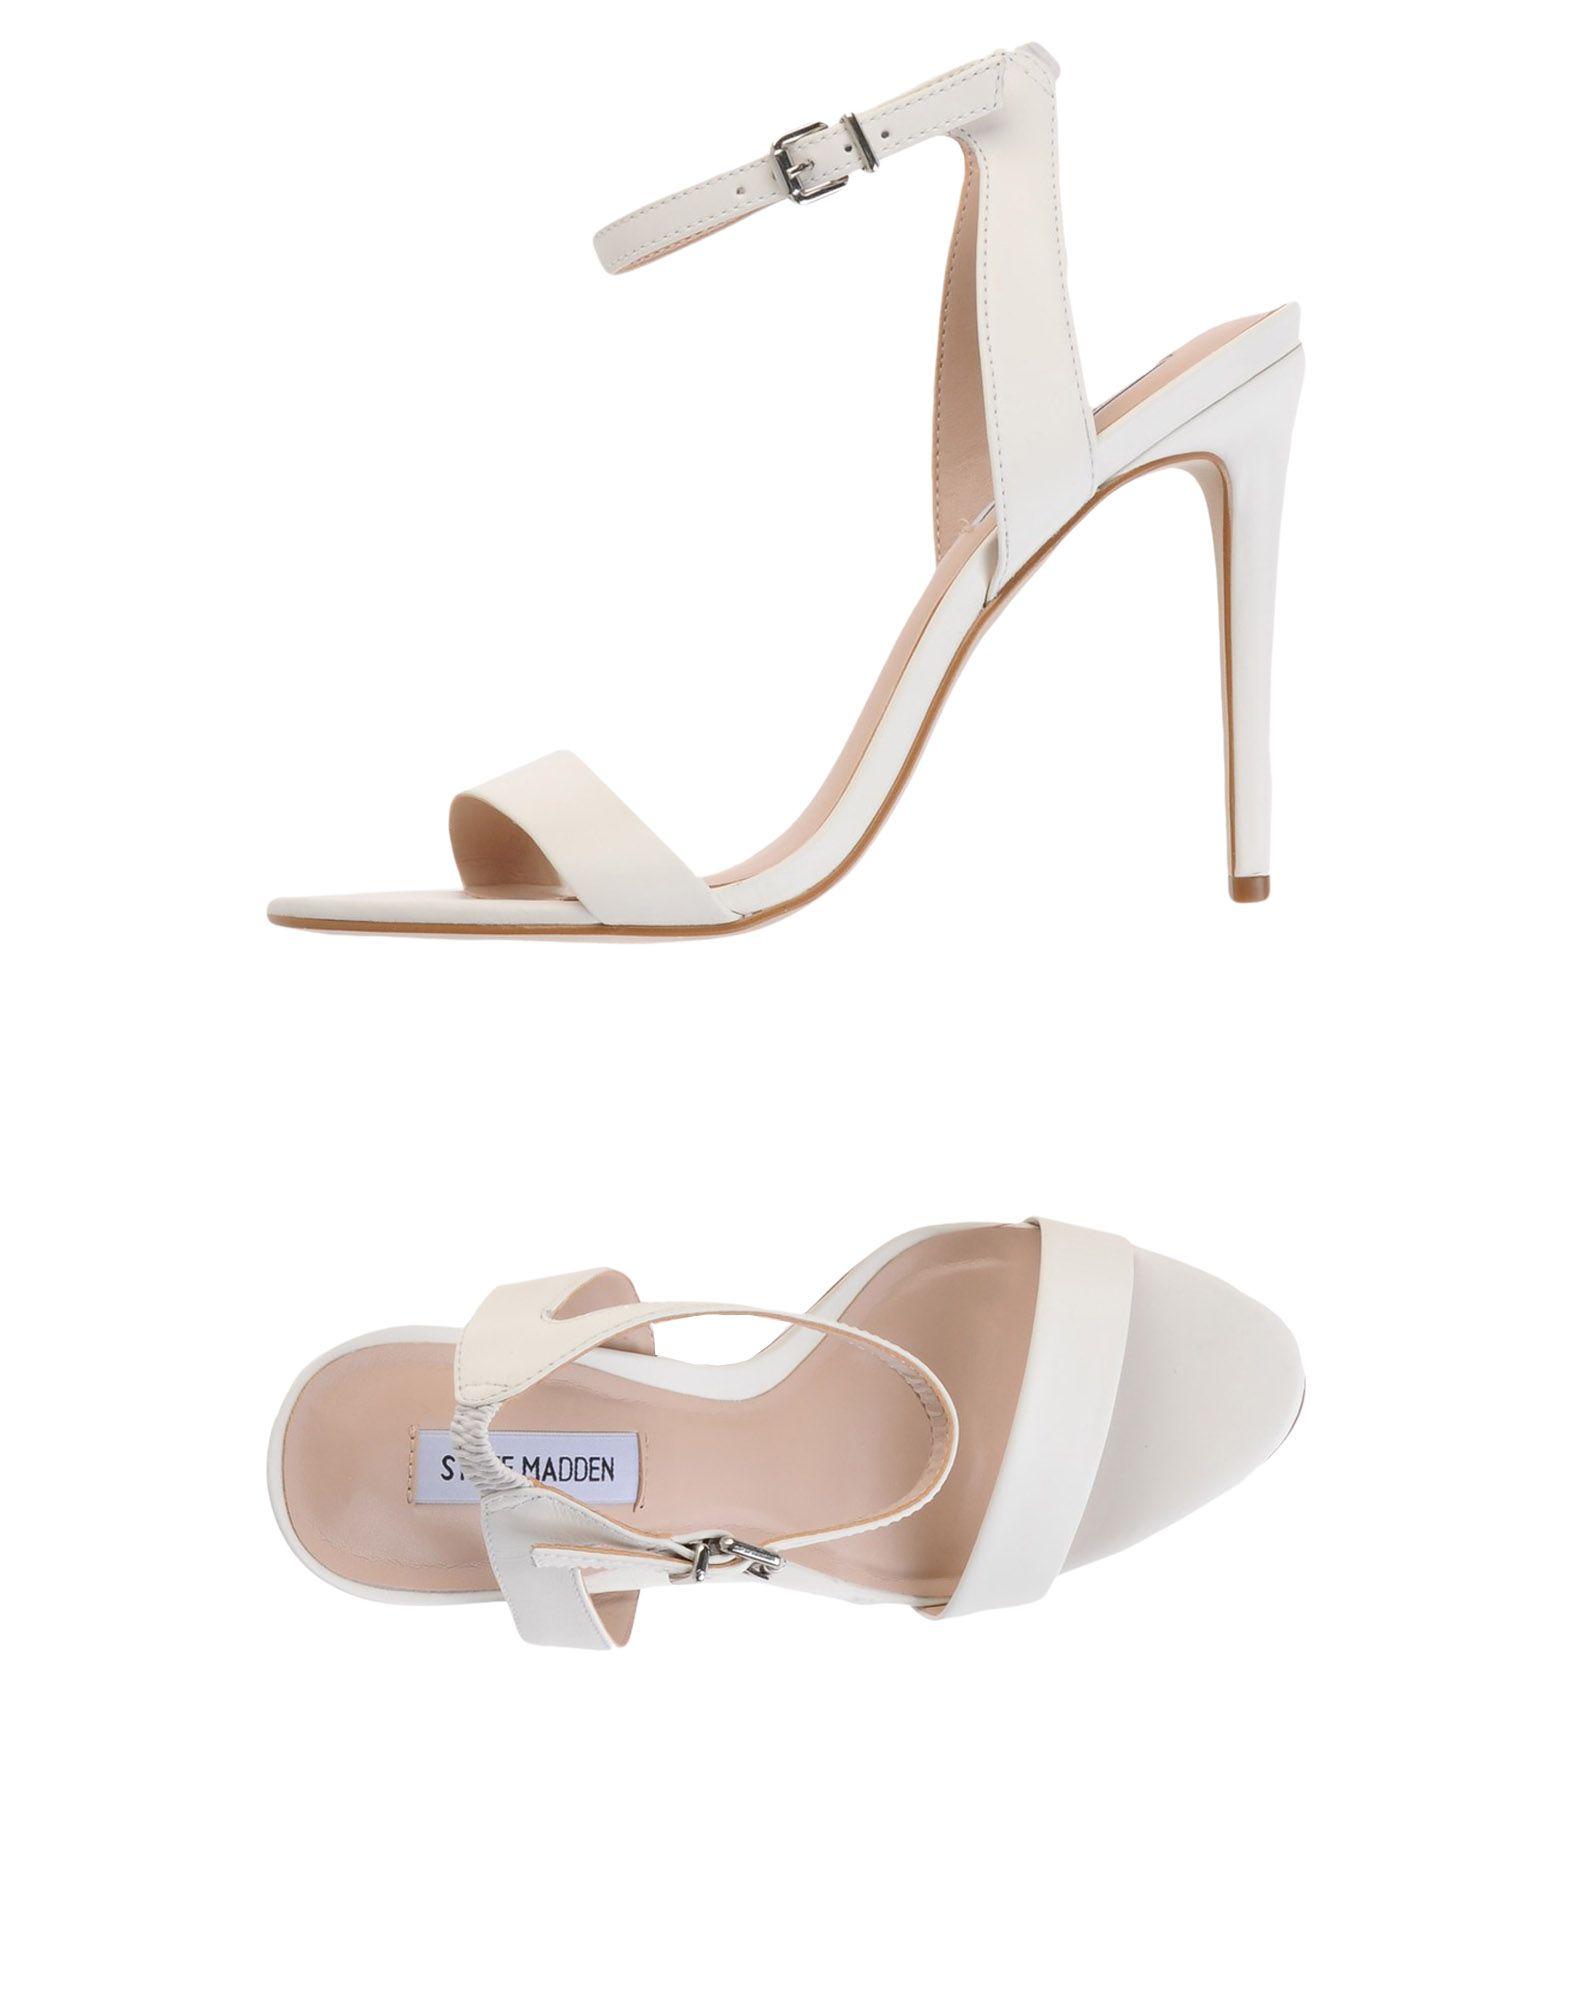 Sandales Steve Madden Landen High Heel Sandal - Femme - Sandales Steve Madden sur